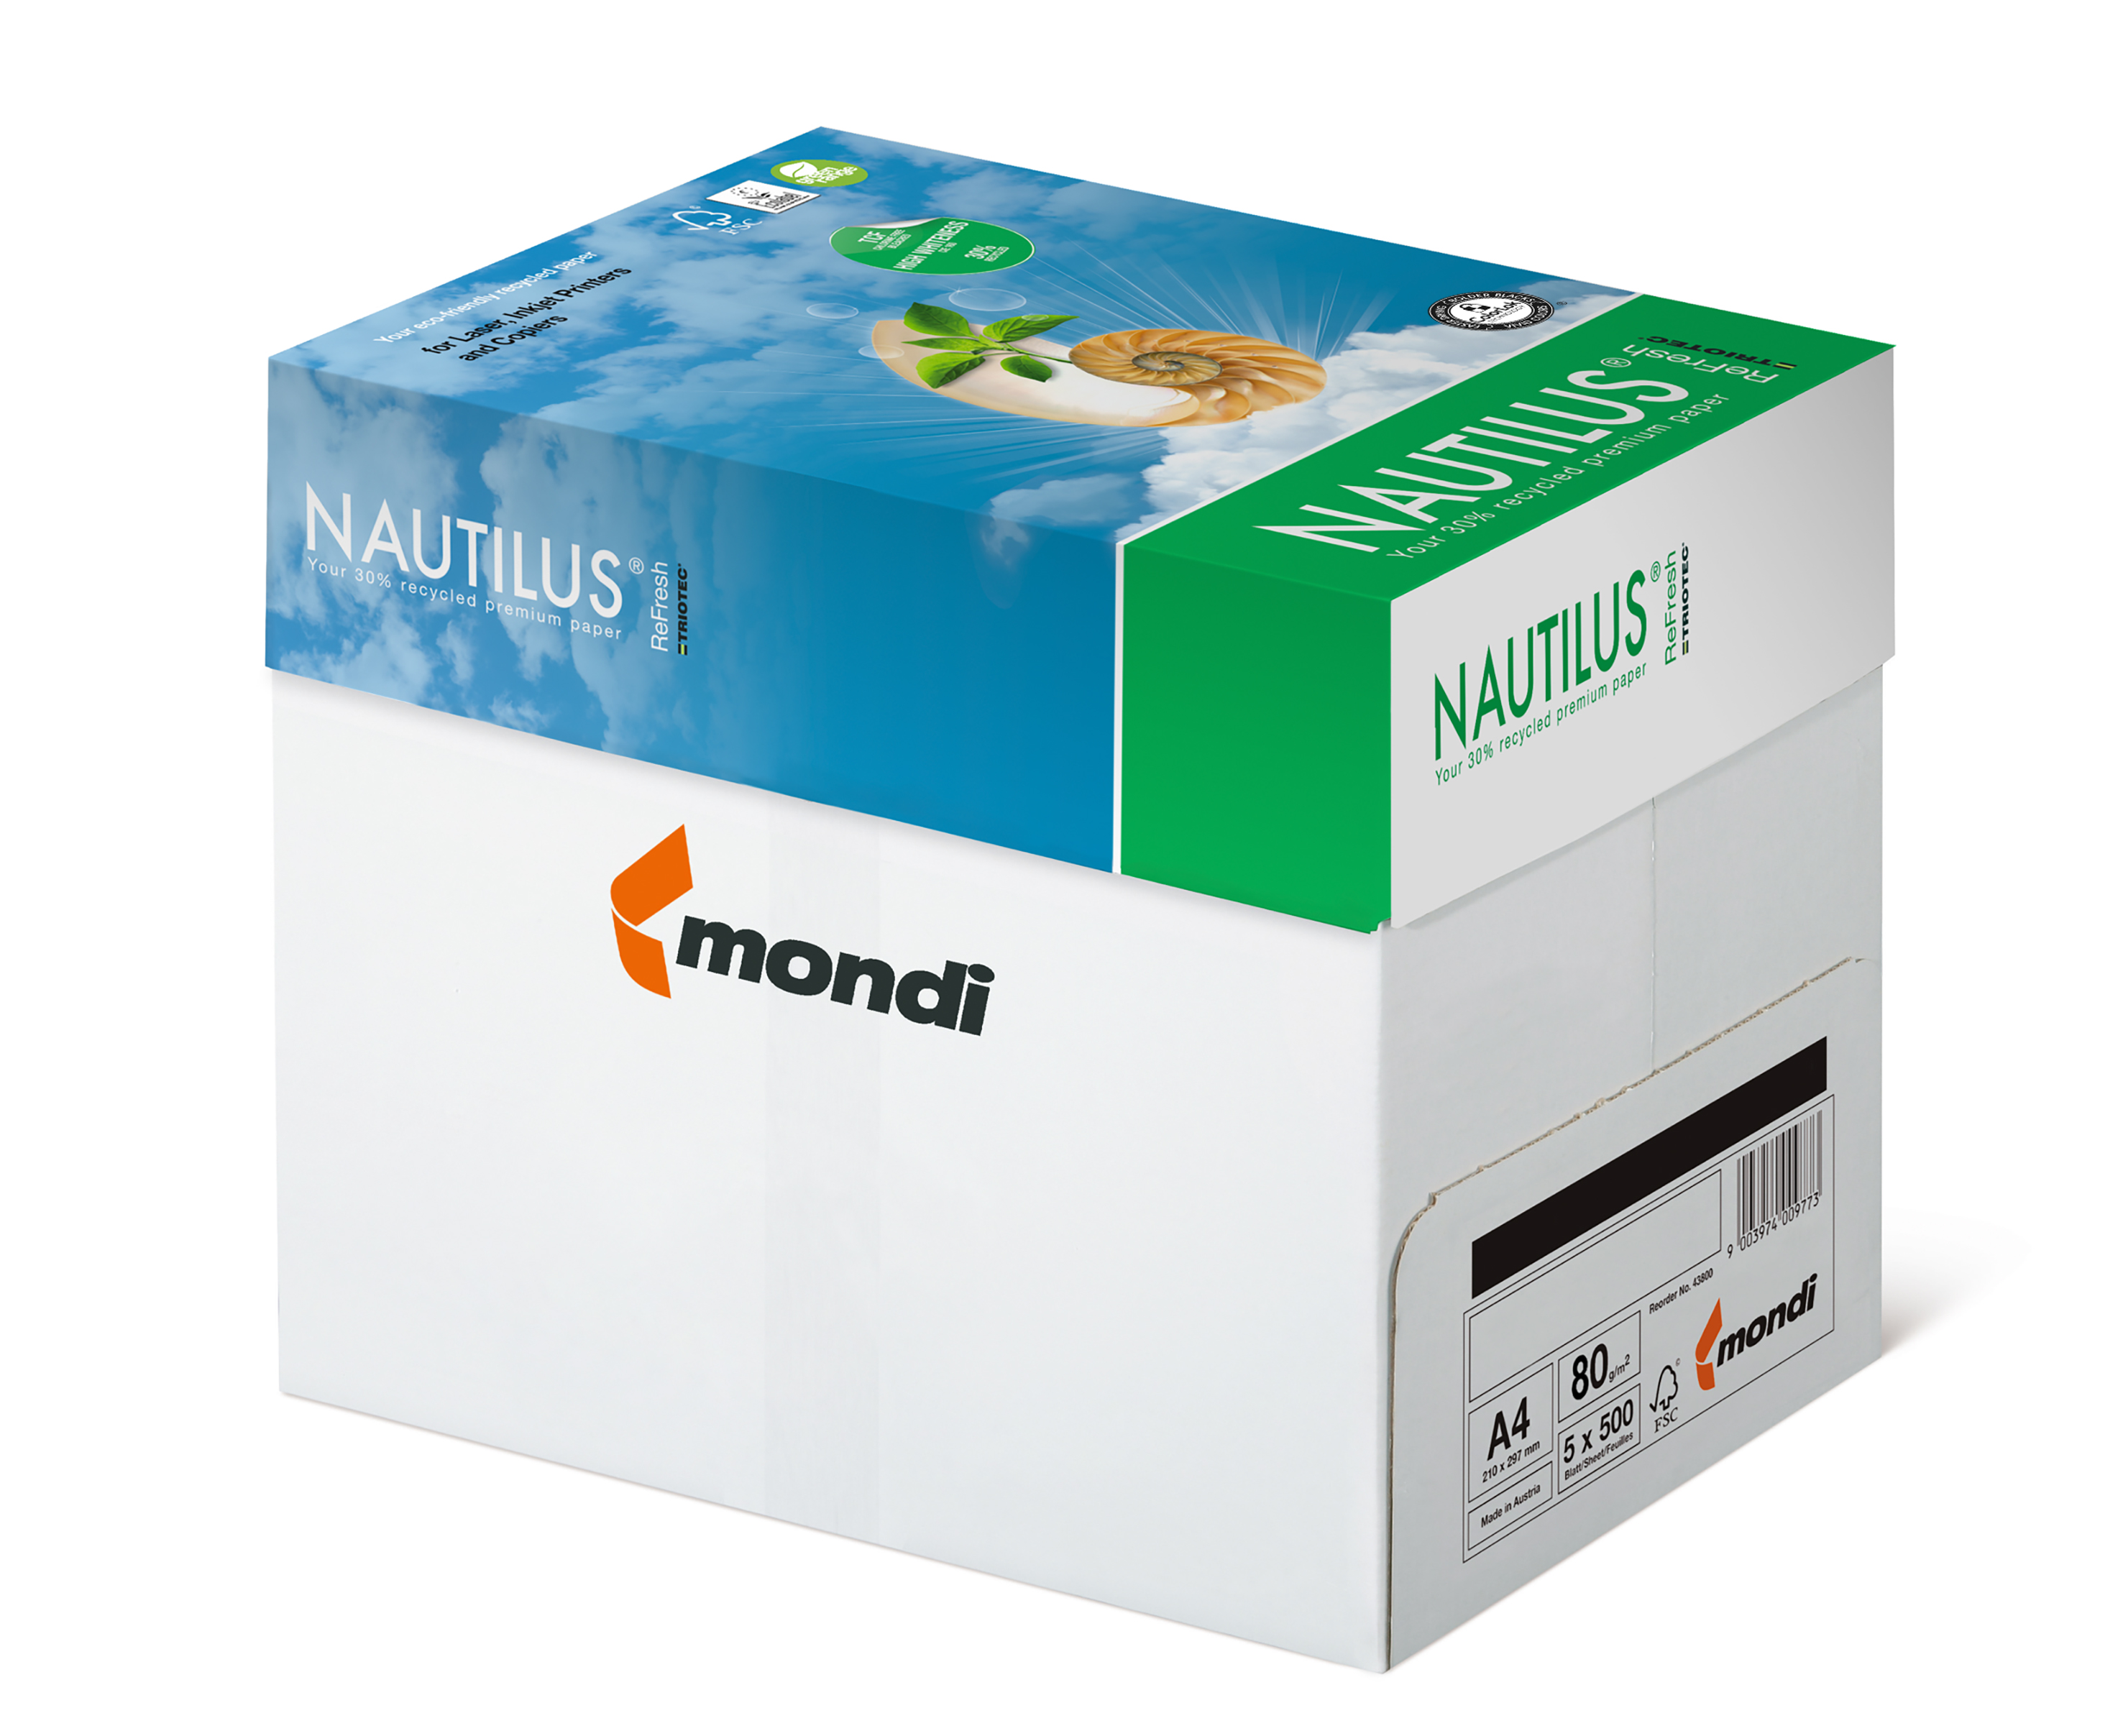 Print Ready Images Mondi Group Ideal 2245 4 Mm Paper Shredder Nautilus Refresh